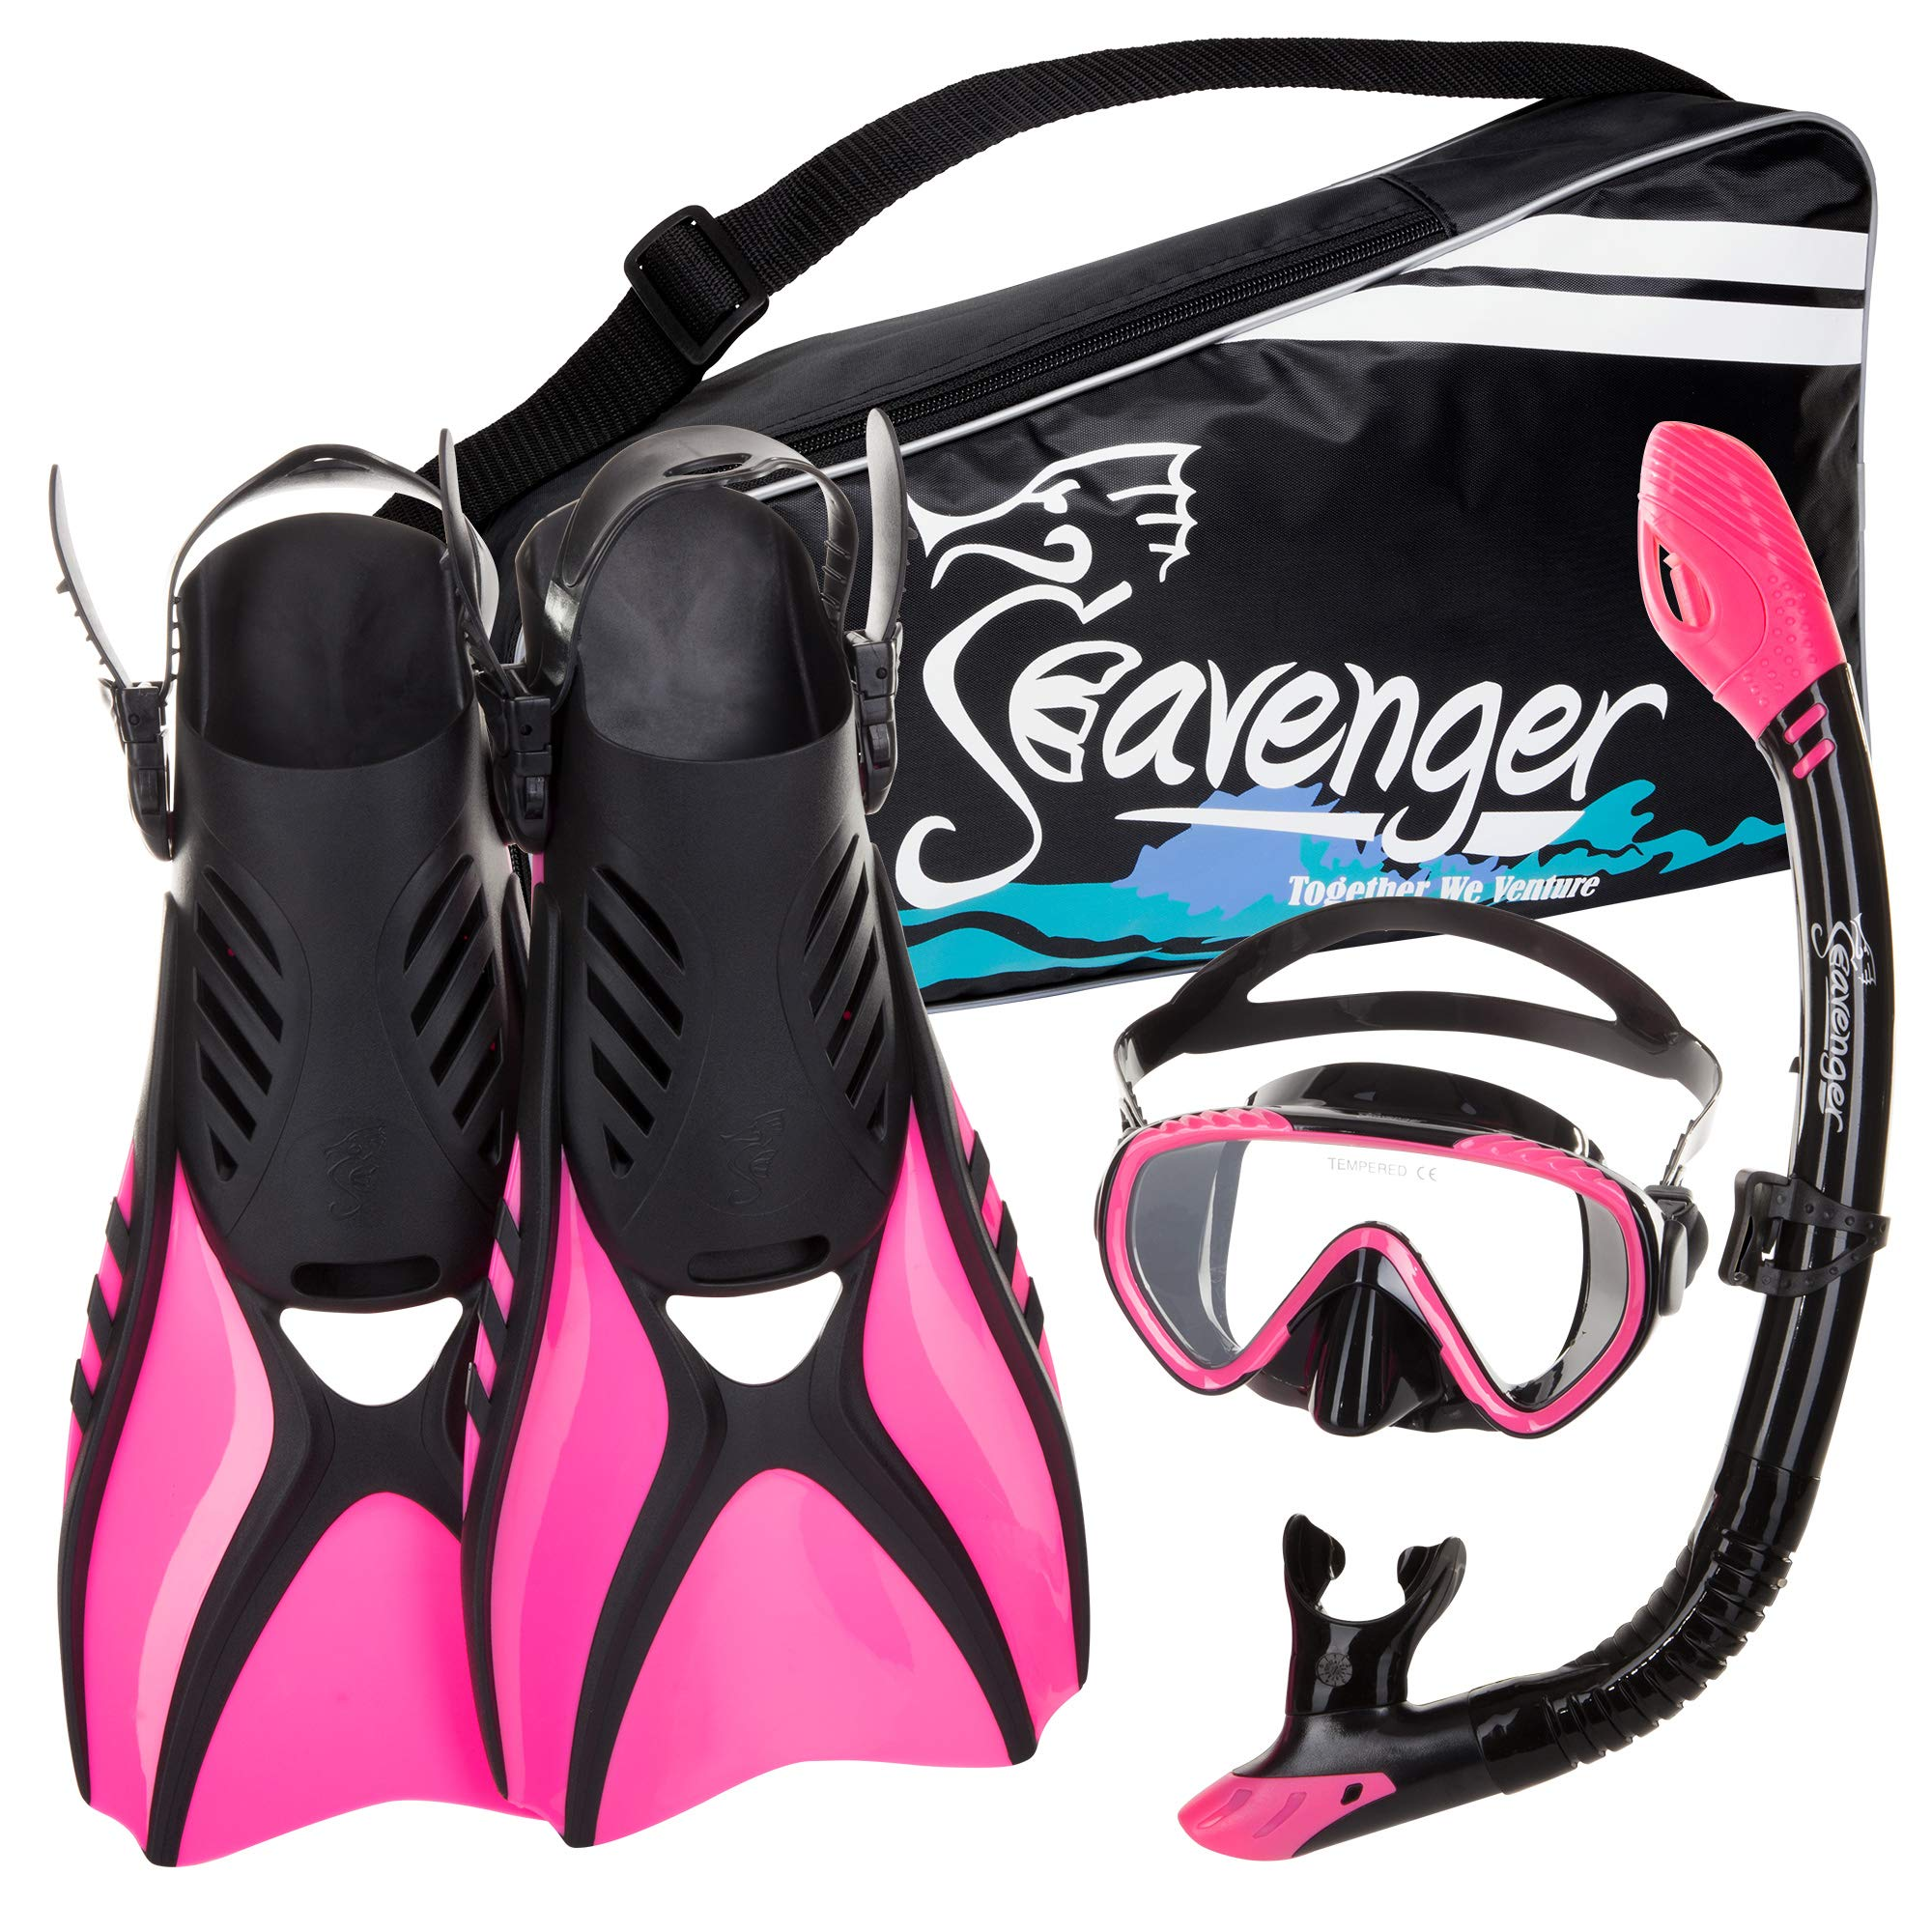 Seavenger Diving Snorkel Set - (Black Silicon/Pink) - M by Seavenger